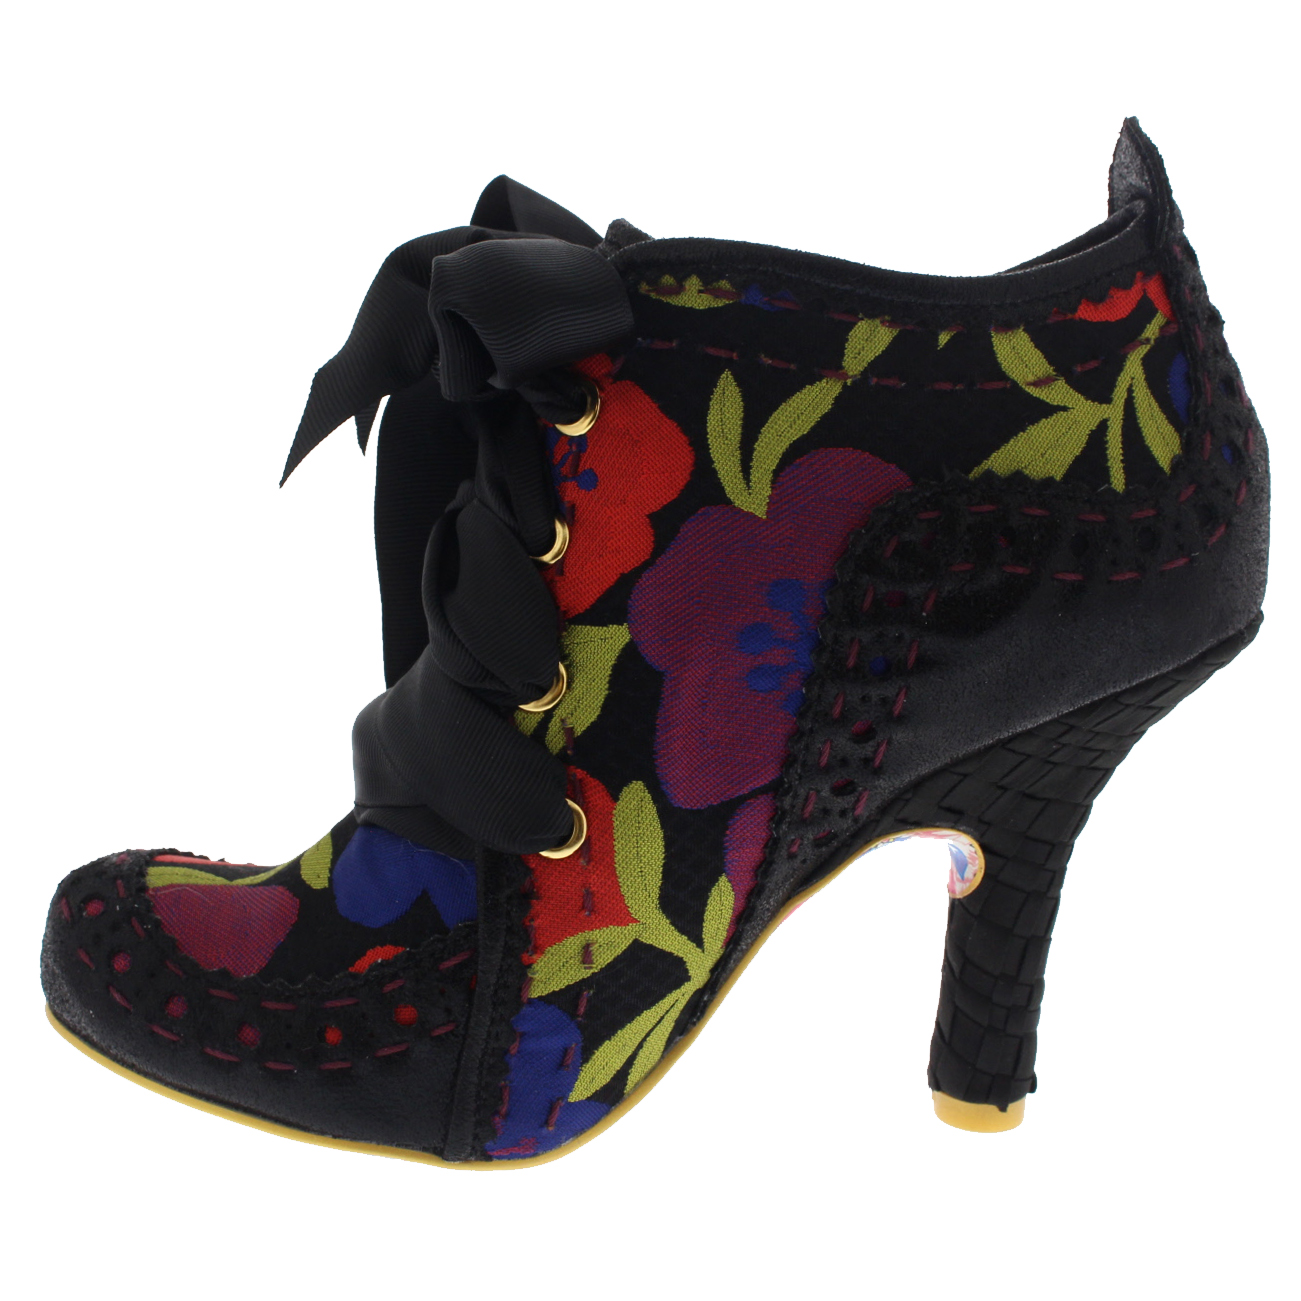 967ce5b9c7ec5 Womens Irregular Choice Abigails Third Party High HEELS Ankle BOOTS ...